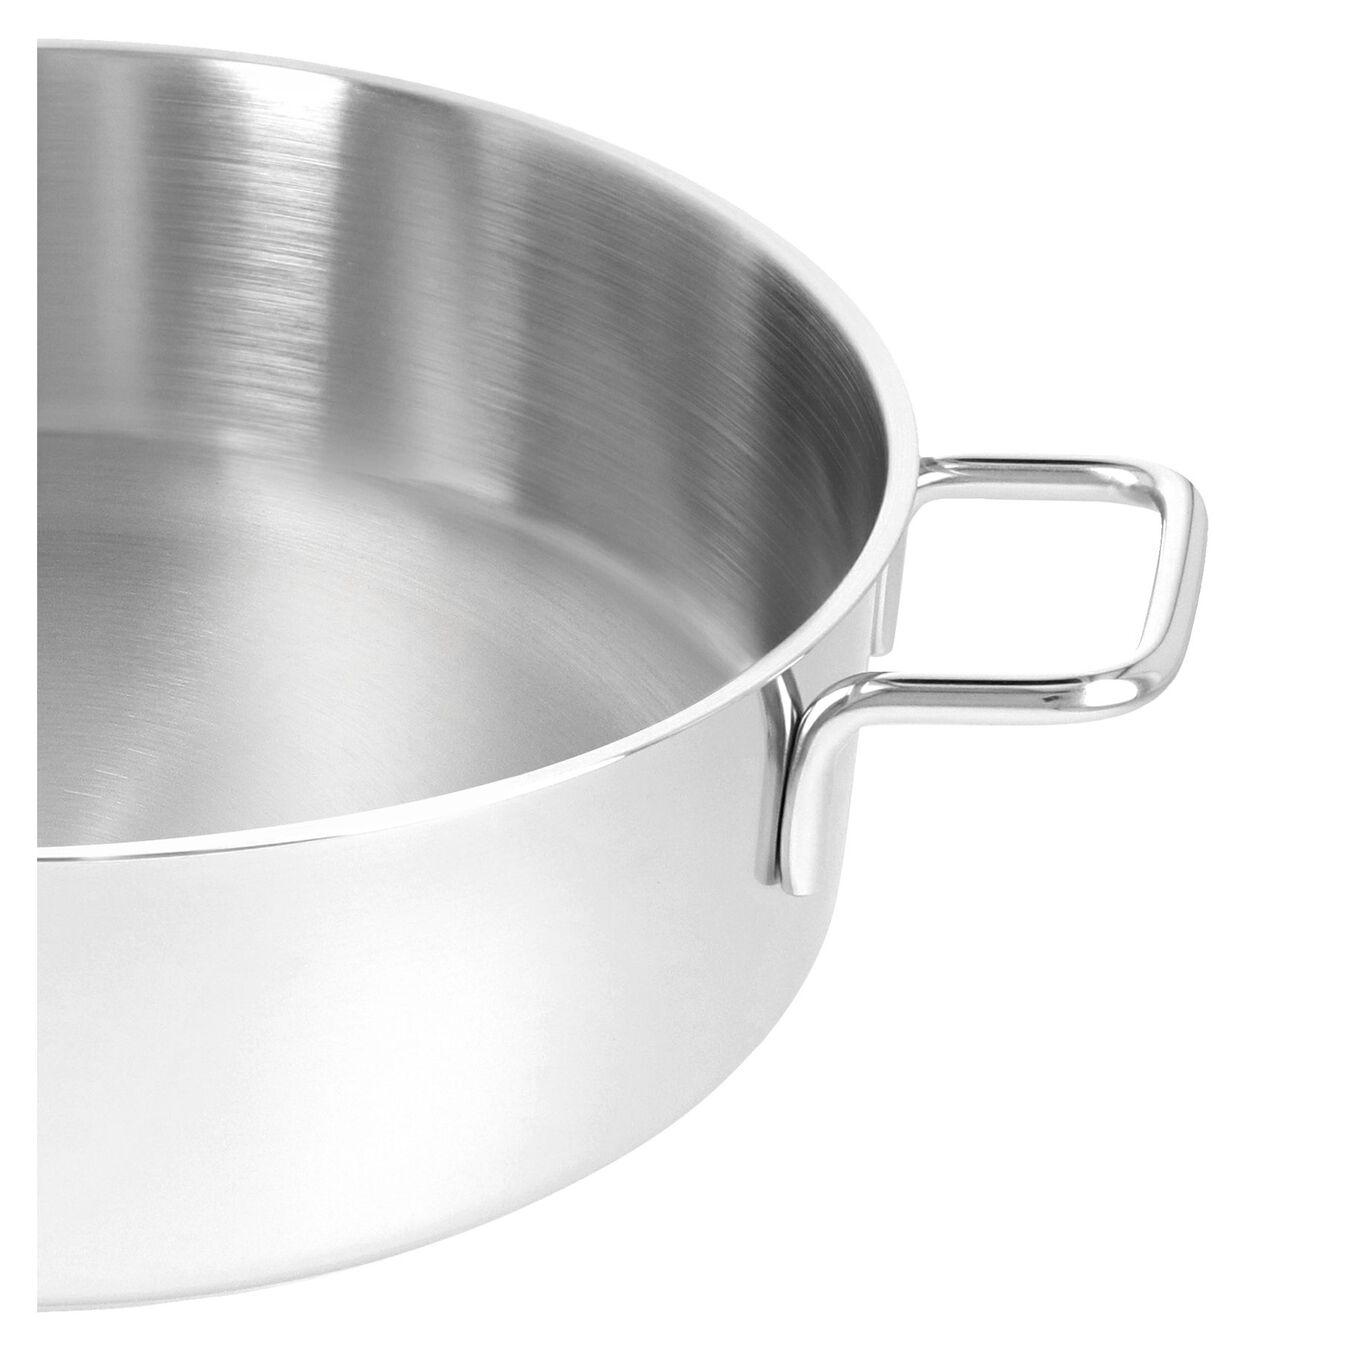 Kookpot met glazen deksel 24 cm / 2,8 l,,large 5